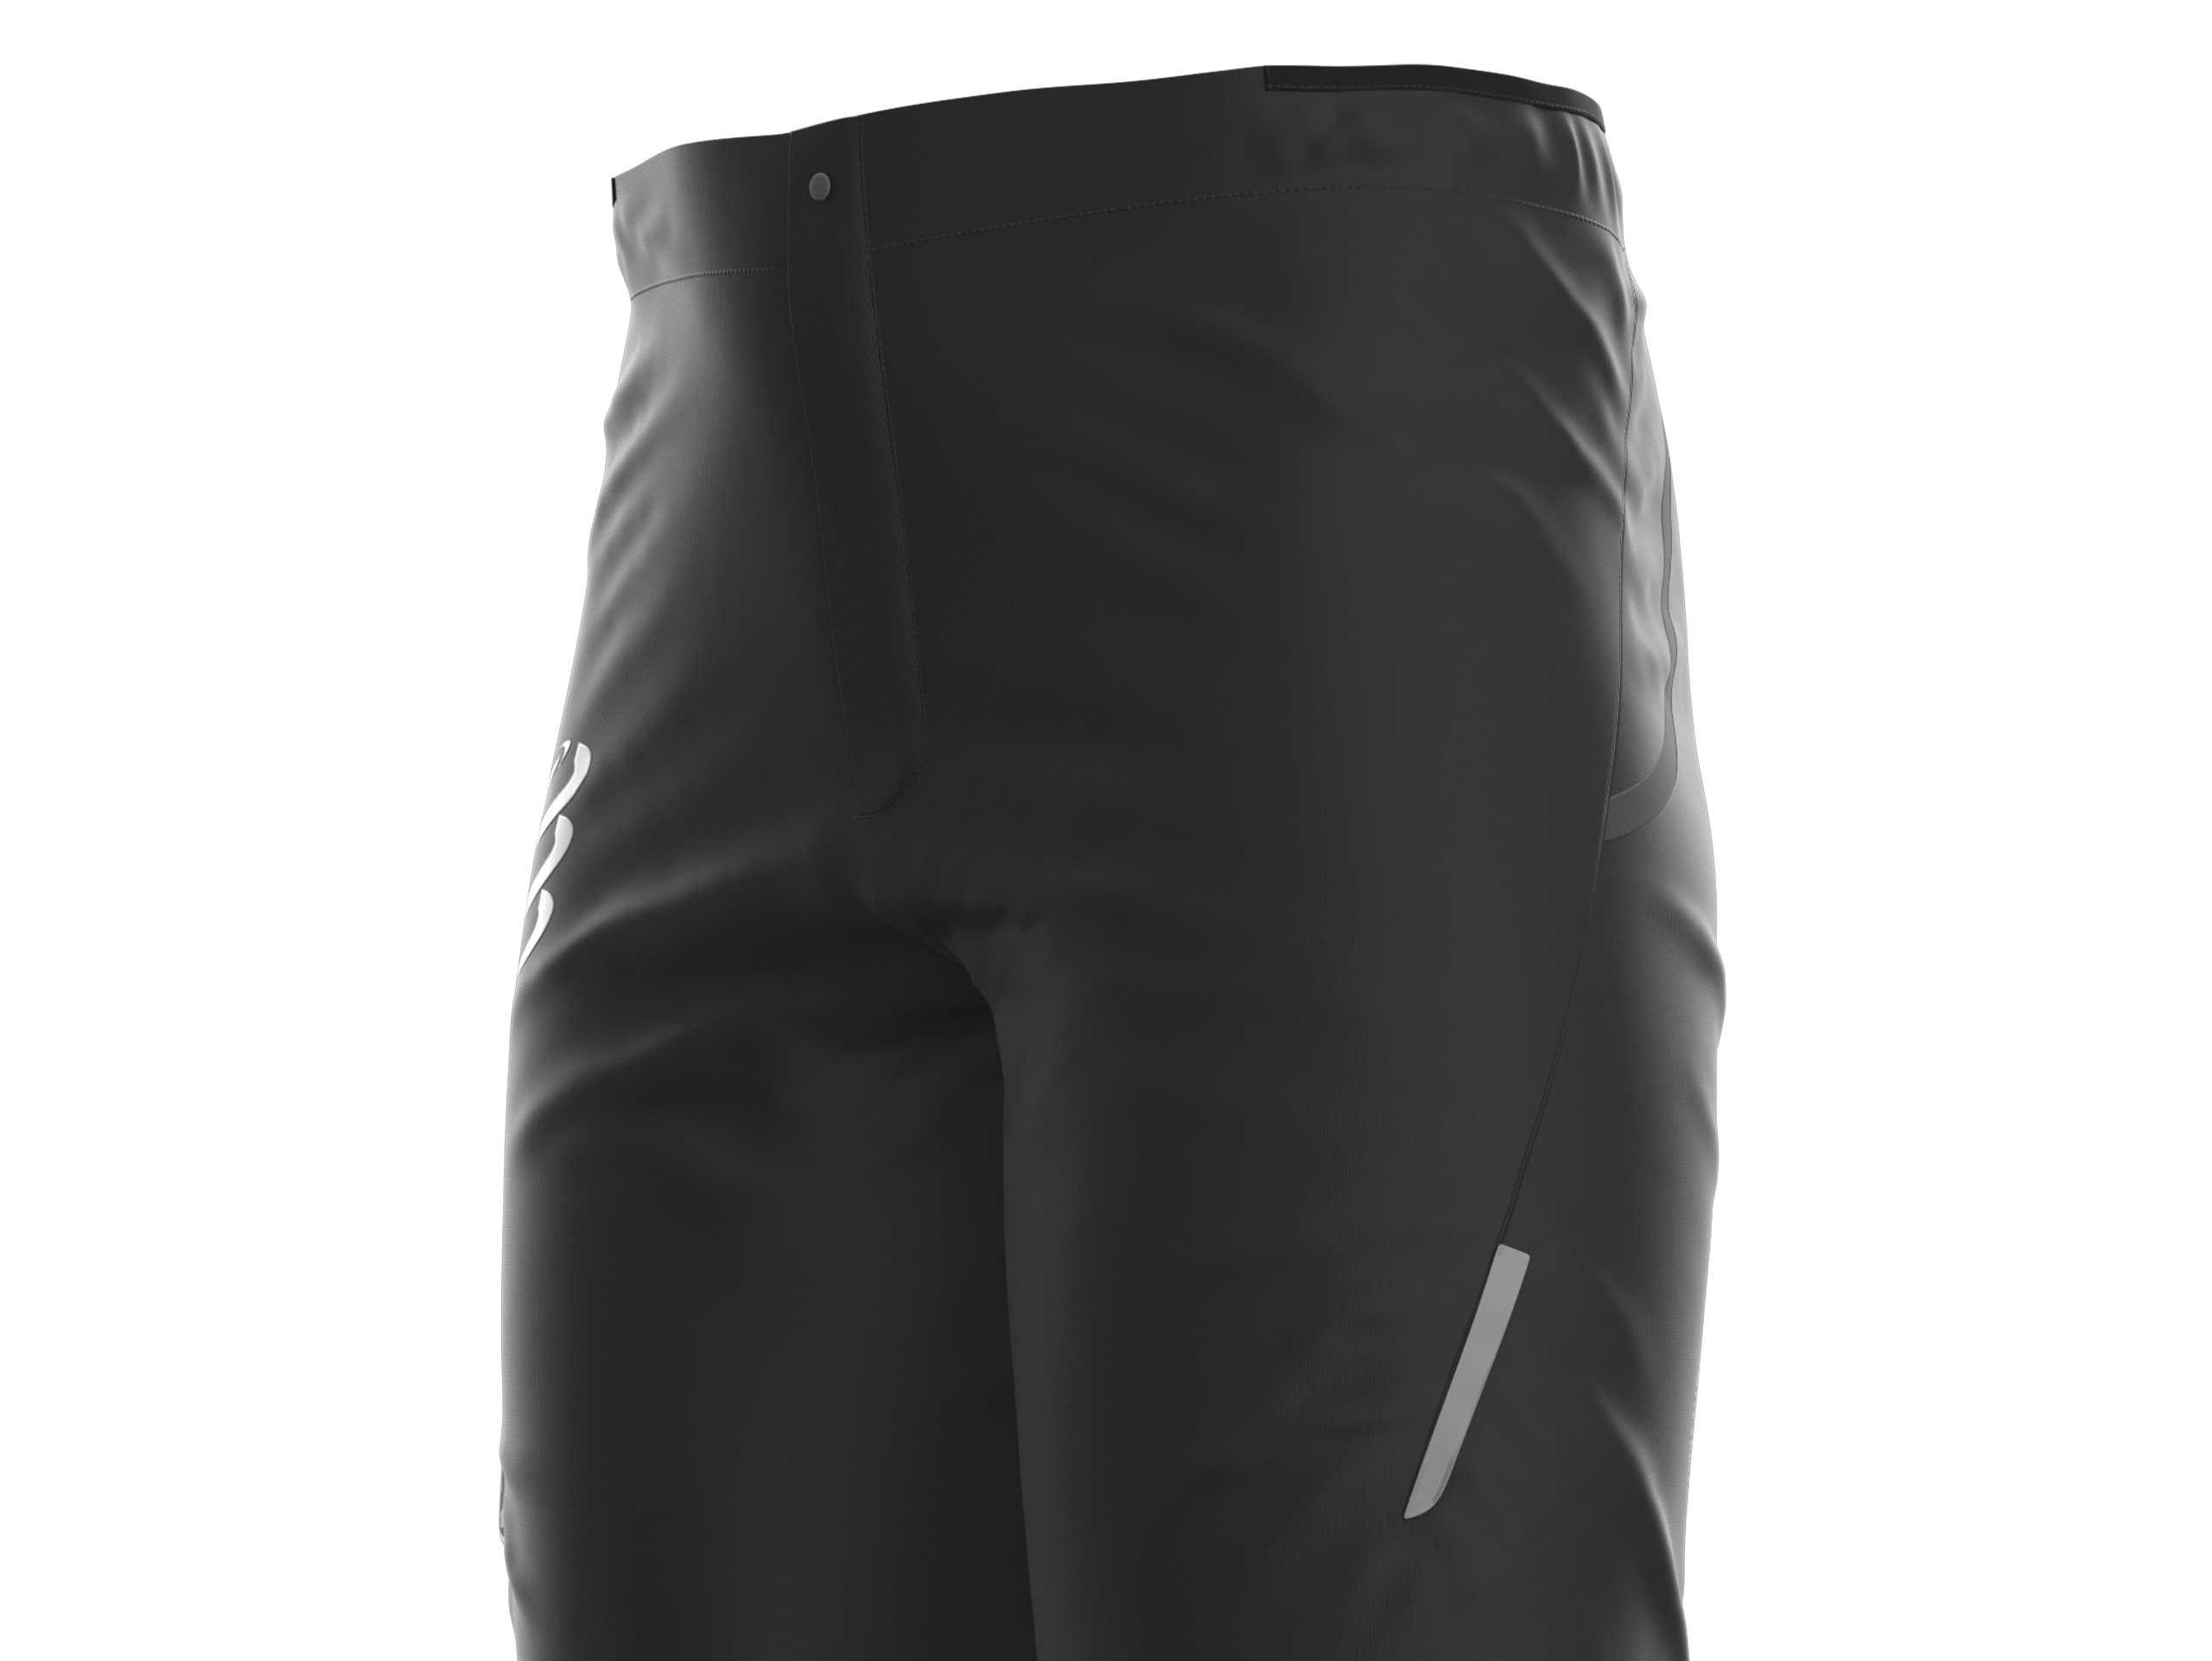 Pantaloni impermeabili Hurricane 10/10 neri